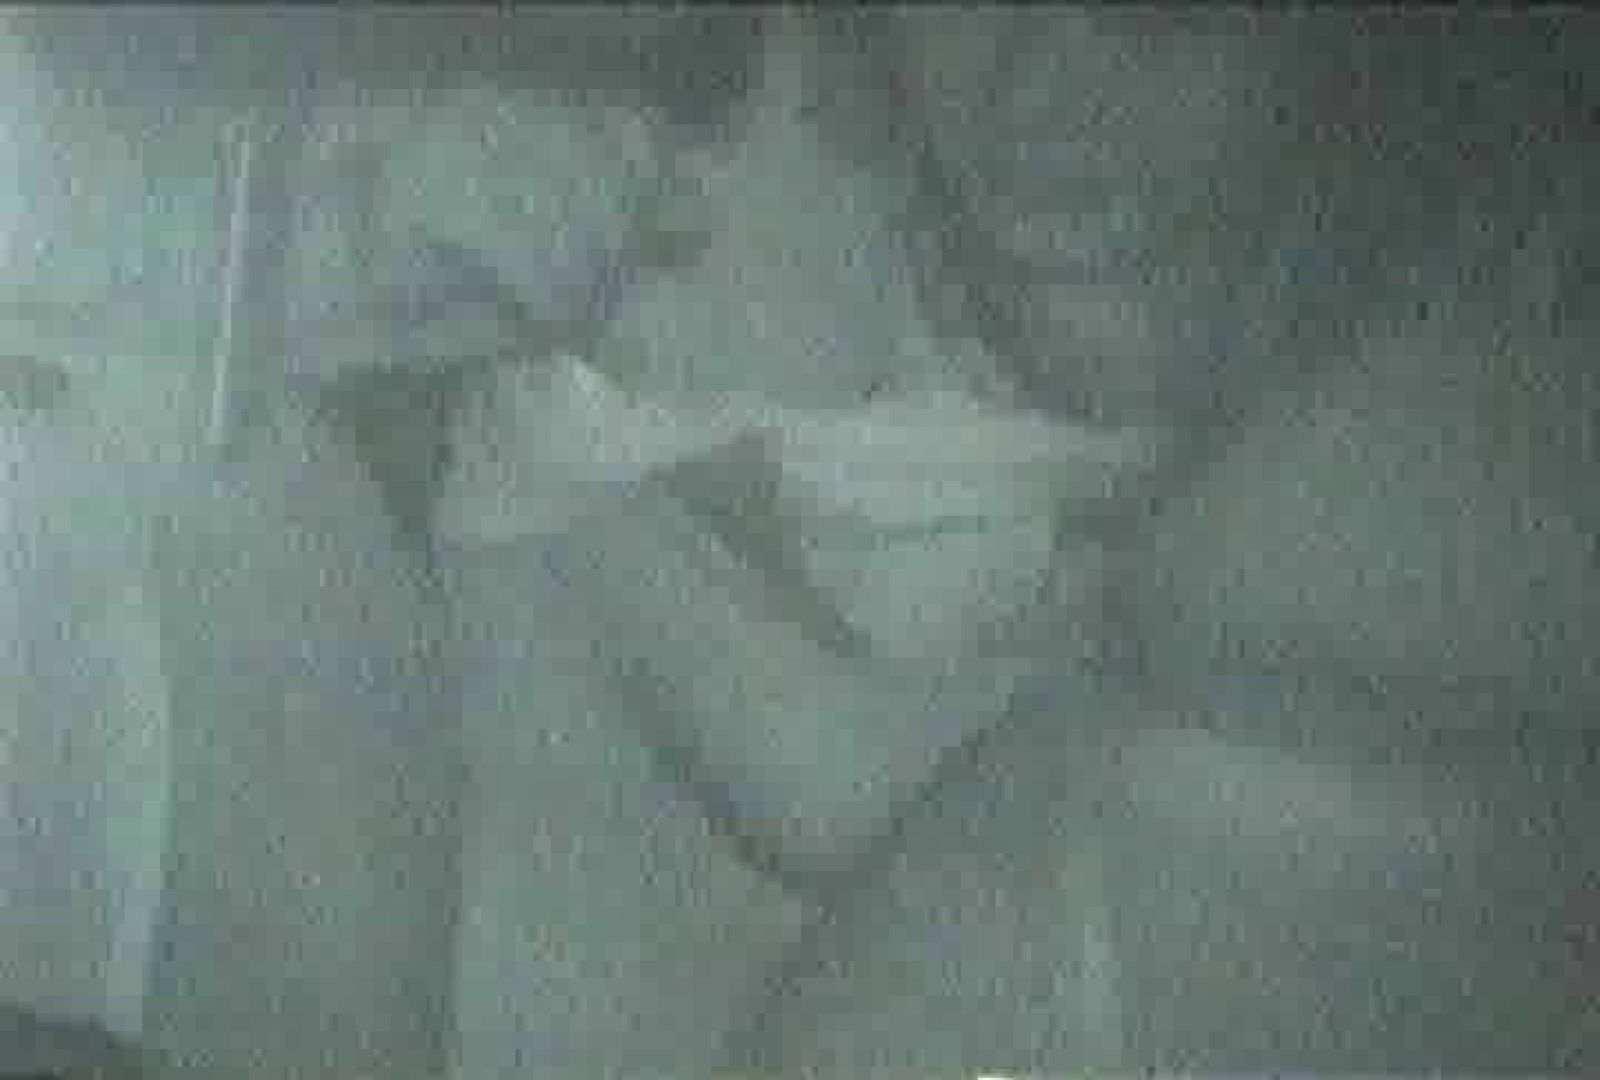 充血監督の深夜の運動会Vol.99 美女OL オメコ無修正動画無料 67連発 54